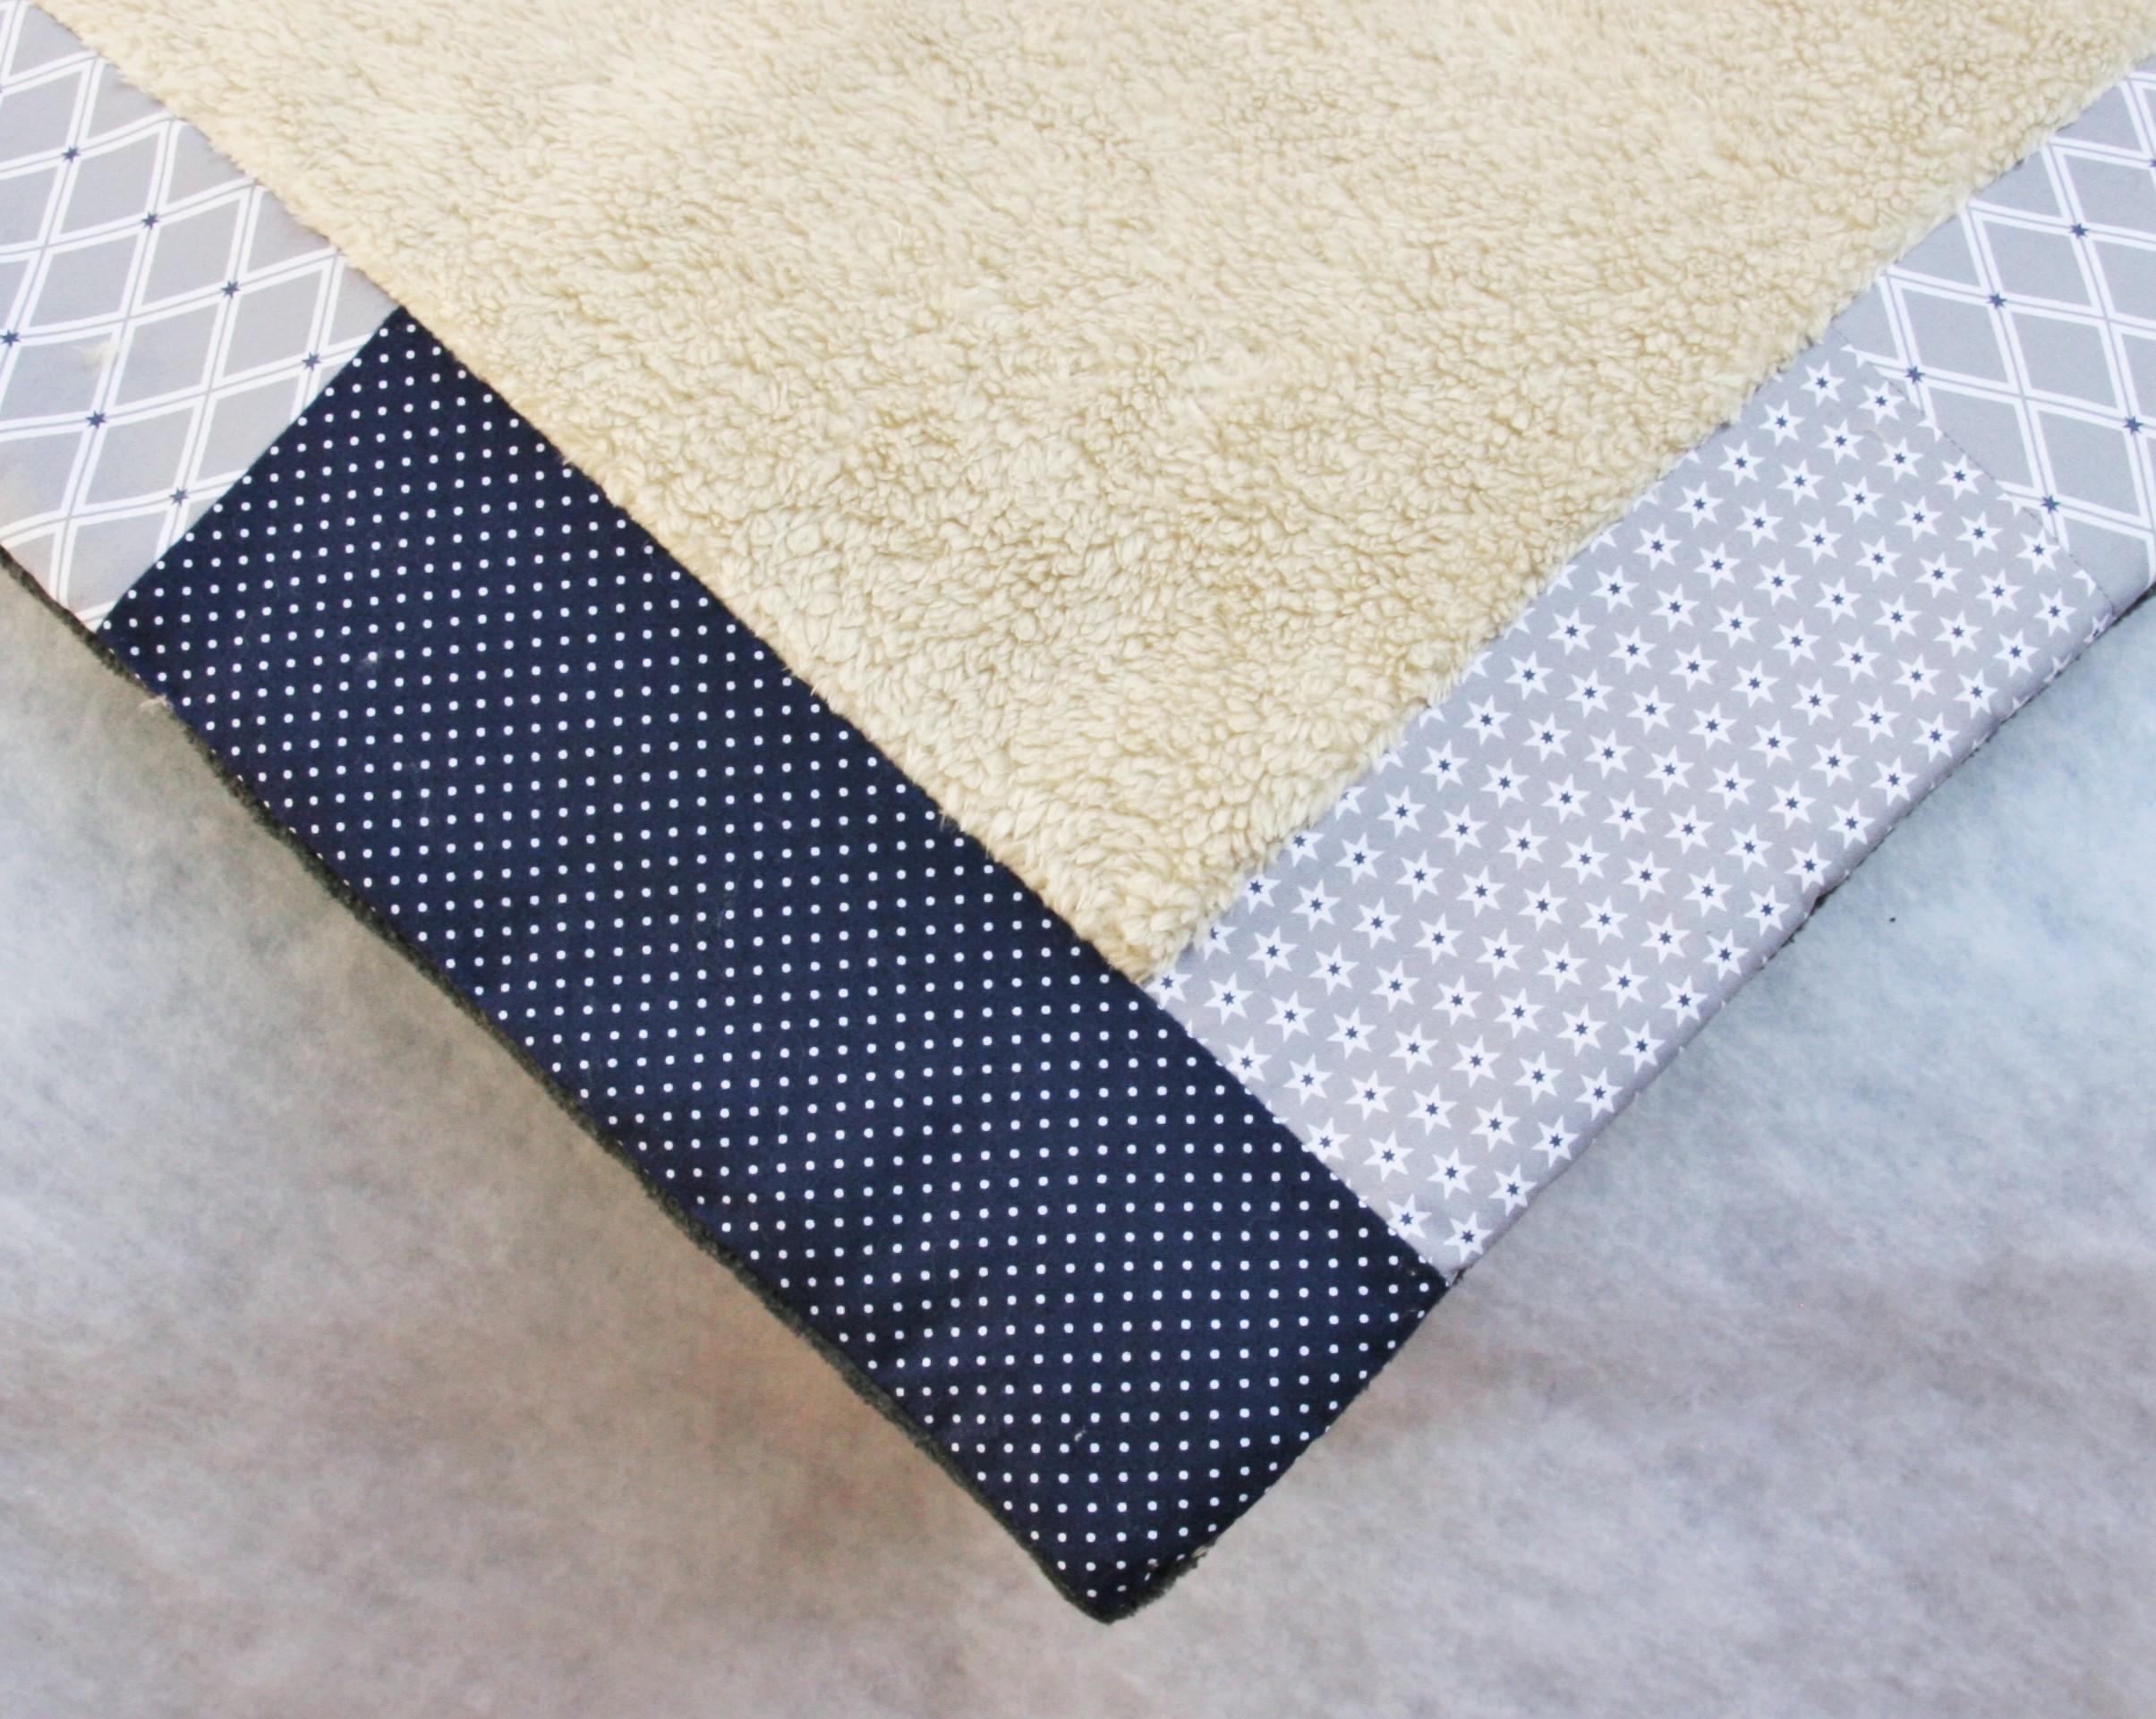 kuschelige Hundedecke blau grau im Patchworkstil